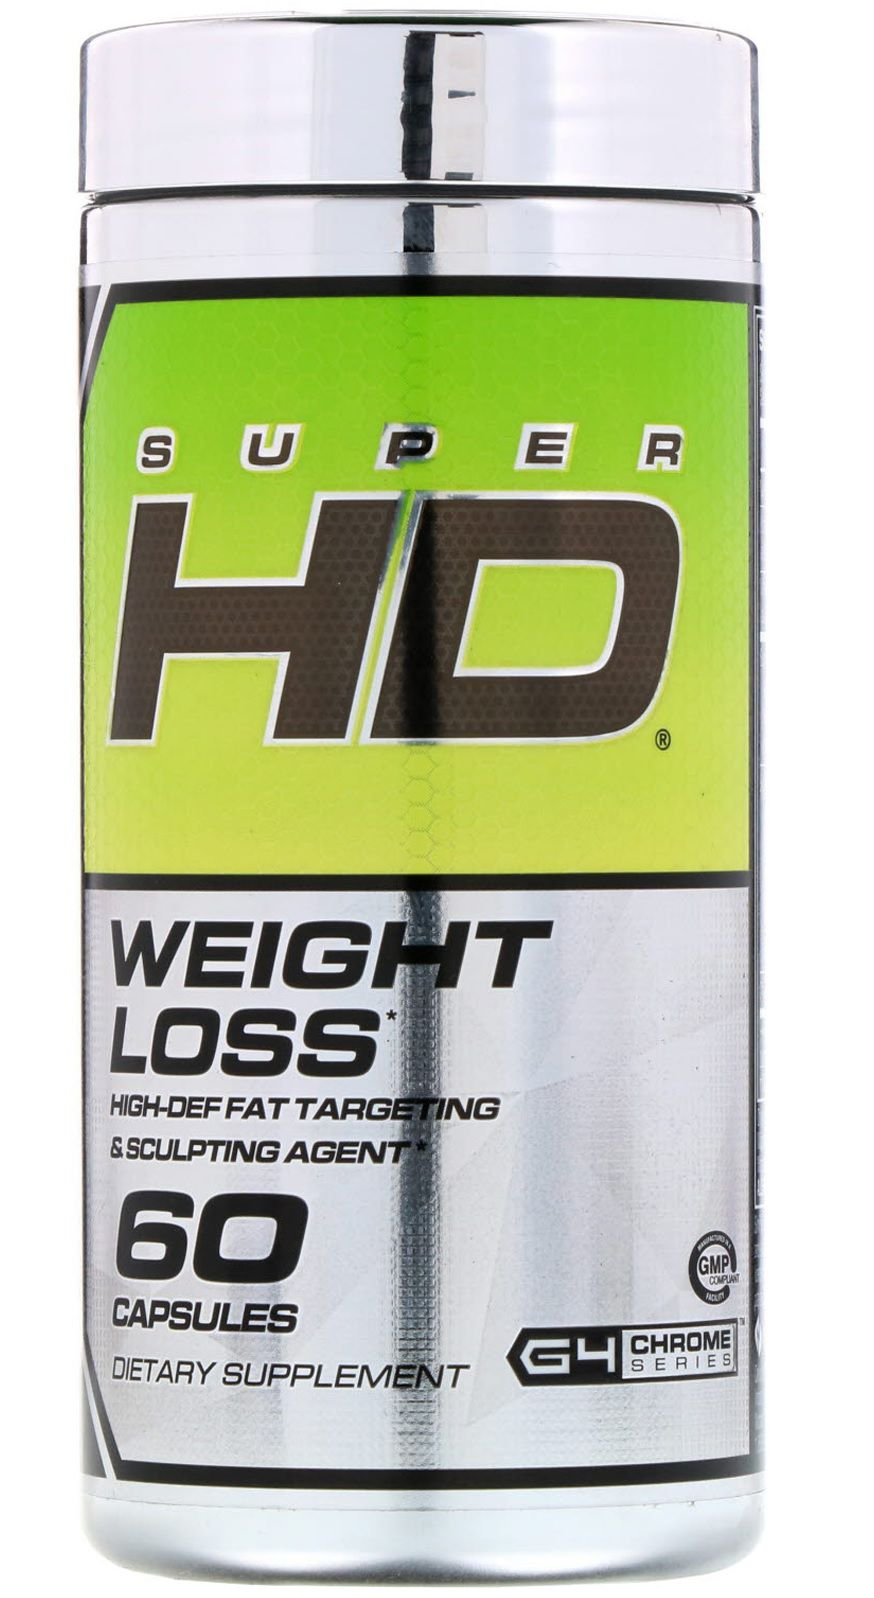 Super HD Weight Loss Cellucor (IMPORTADO) - 60 caps